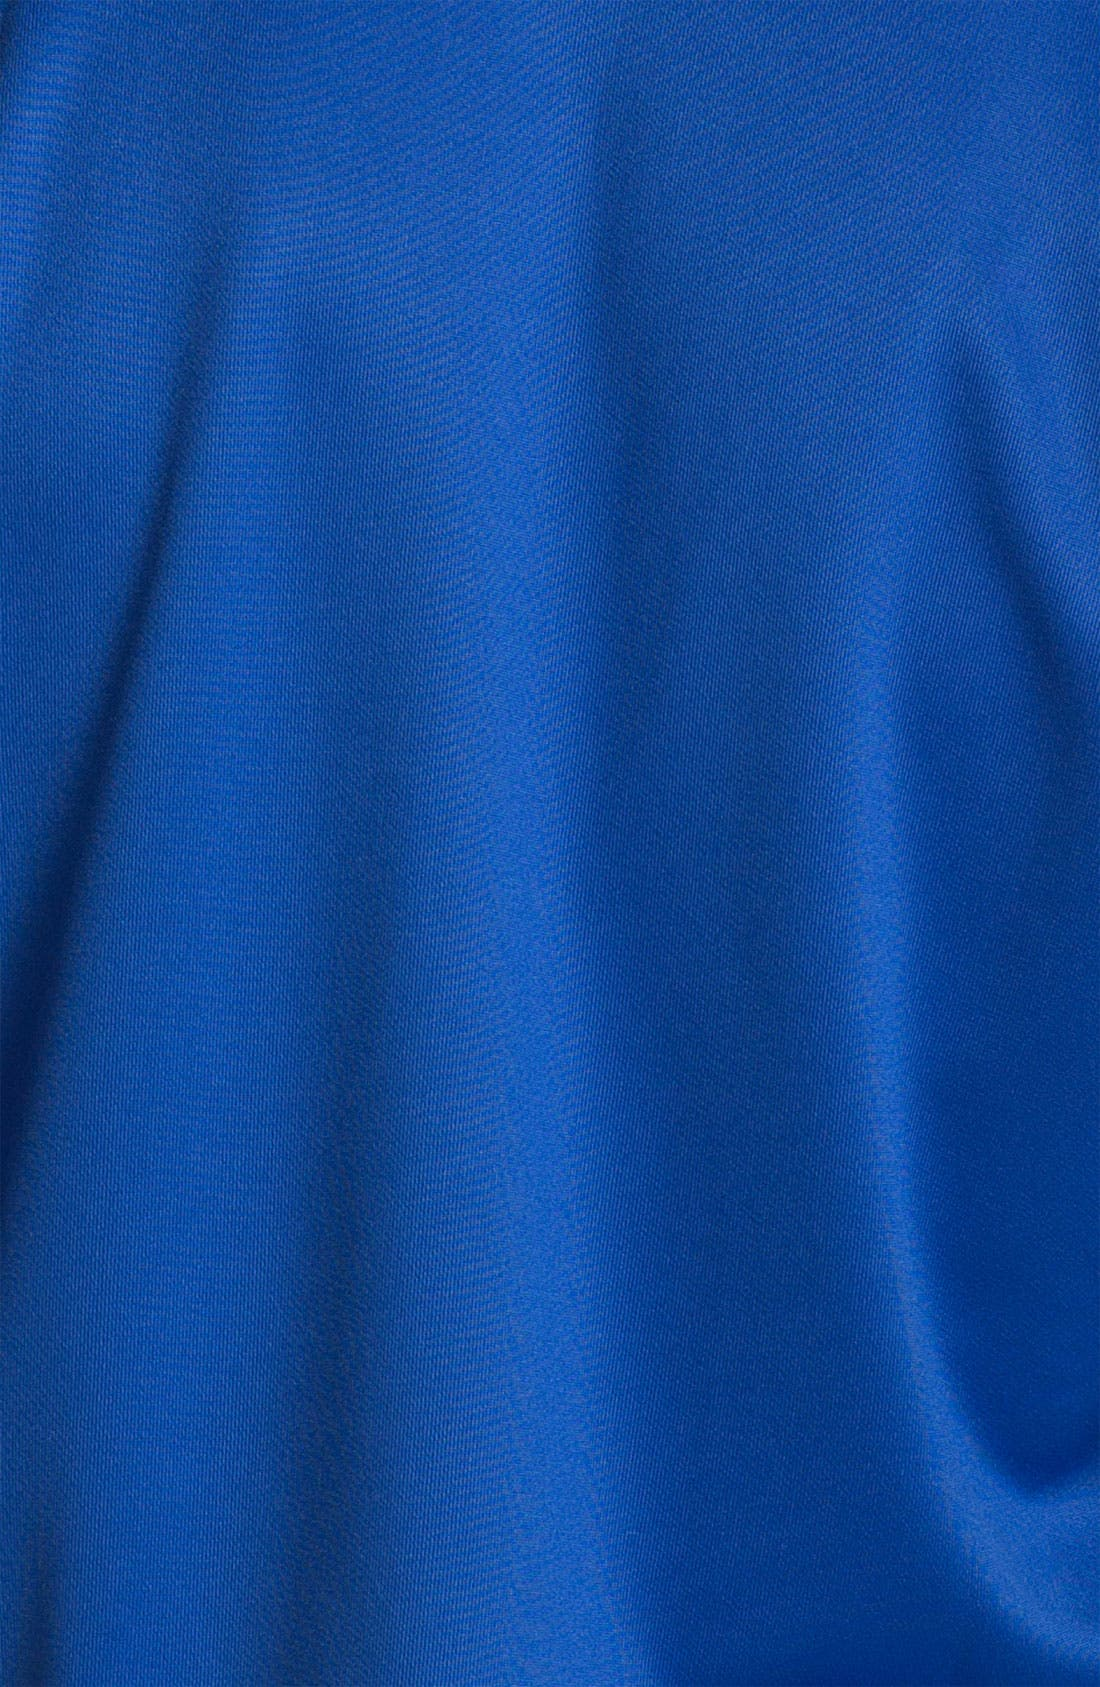 Alternate Image 3  - Nike 'HBR' Track Jacket